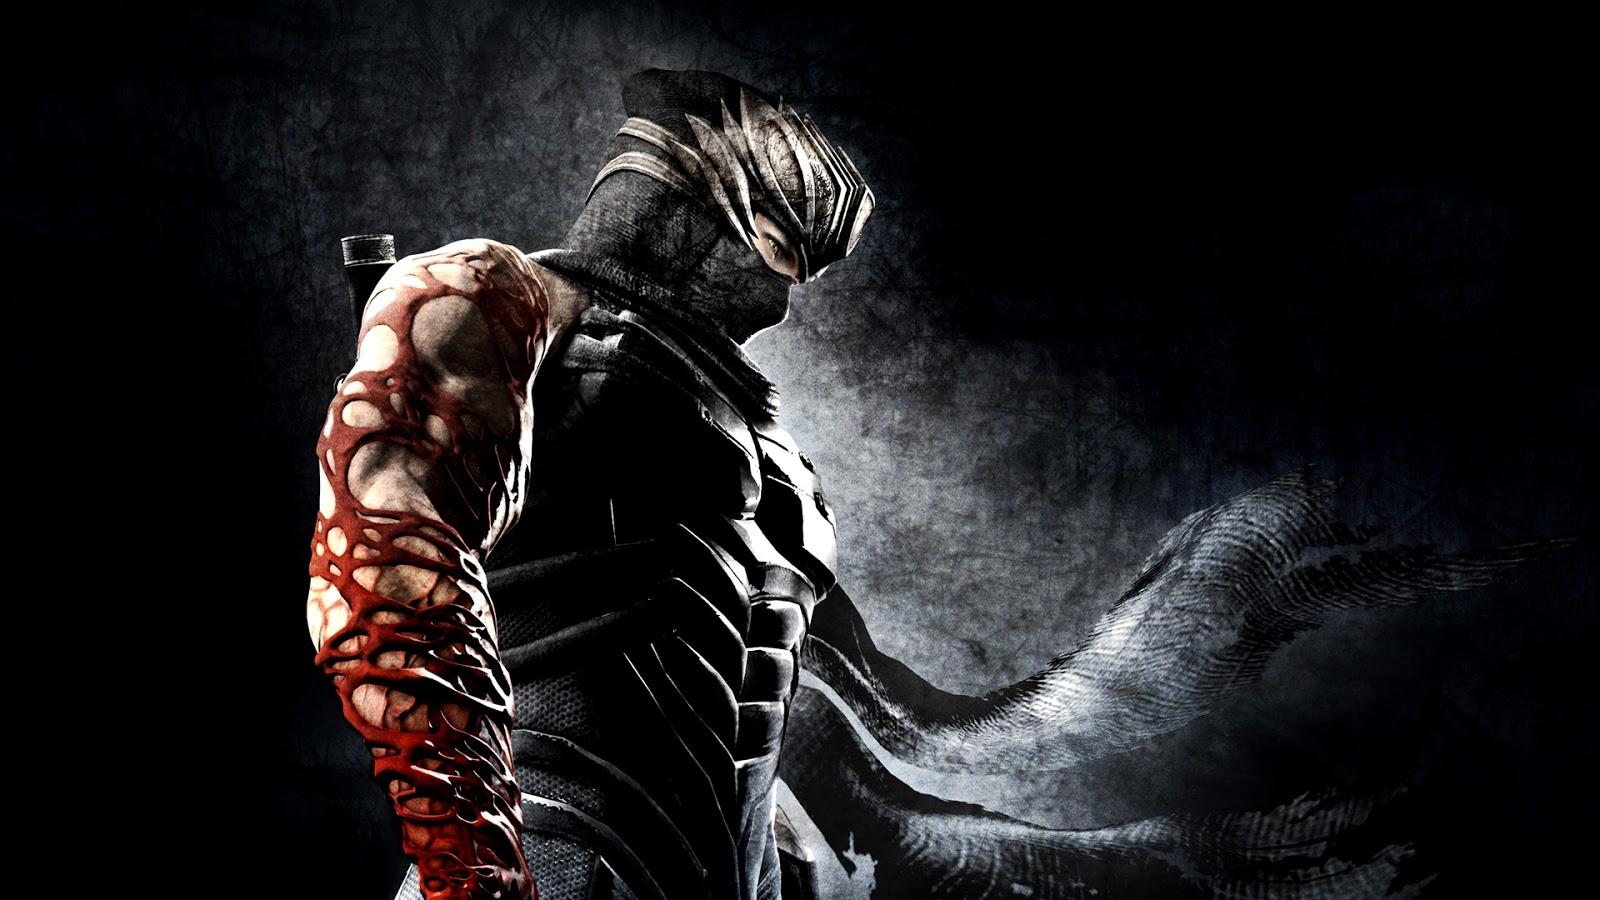 http://3.bp.blogspot.com/-5Aj1yM4TPiY/UMopk7ARvVI/AAAAAAAAEhE/DRoVeOy9g3Y/s1600/ninja-gaiden-3-wallpaper.jpg